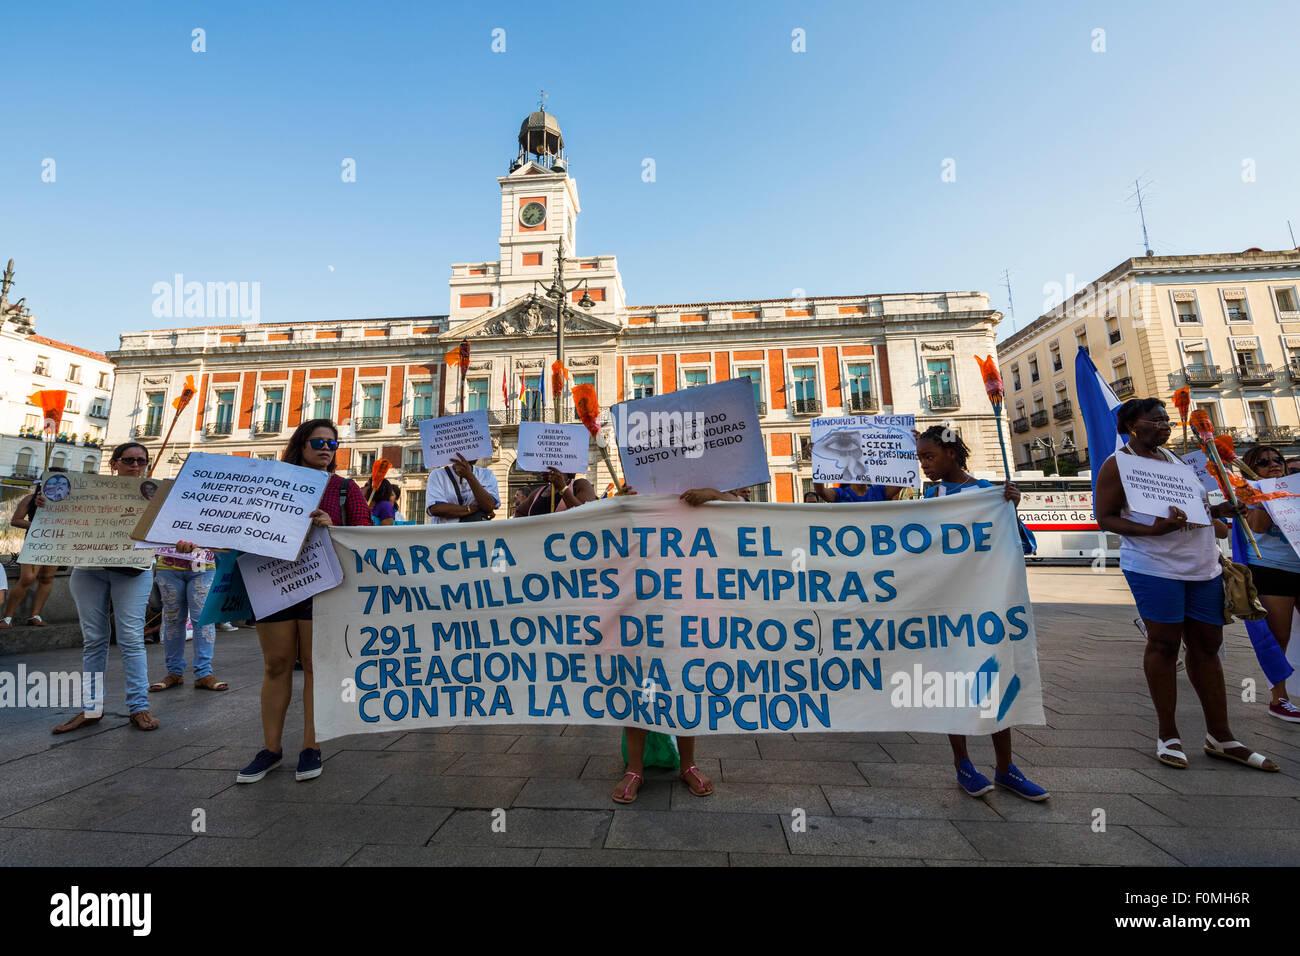 Hondurans protesting against corruption in Honduras, Puerta del Sol, Madrid, Spain Stock Photo